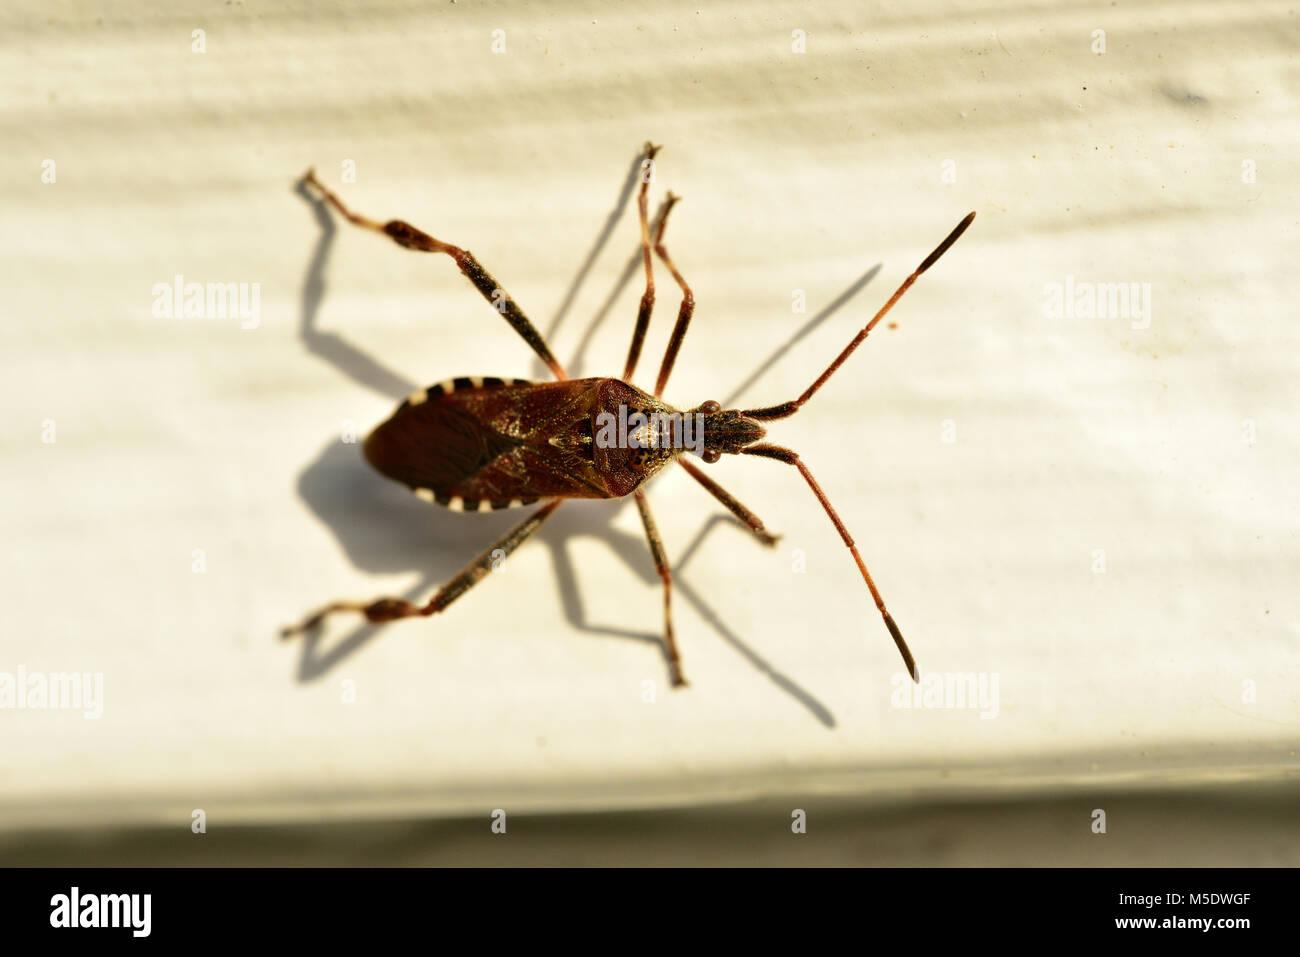 Western conifer seed bug, Leptoglossus occidentalis, Coreidae, bug, insect, animal, Zurich, Switzerland - Stock Image